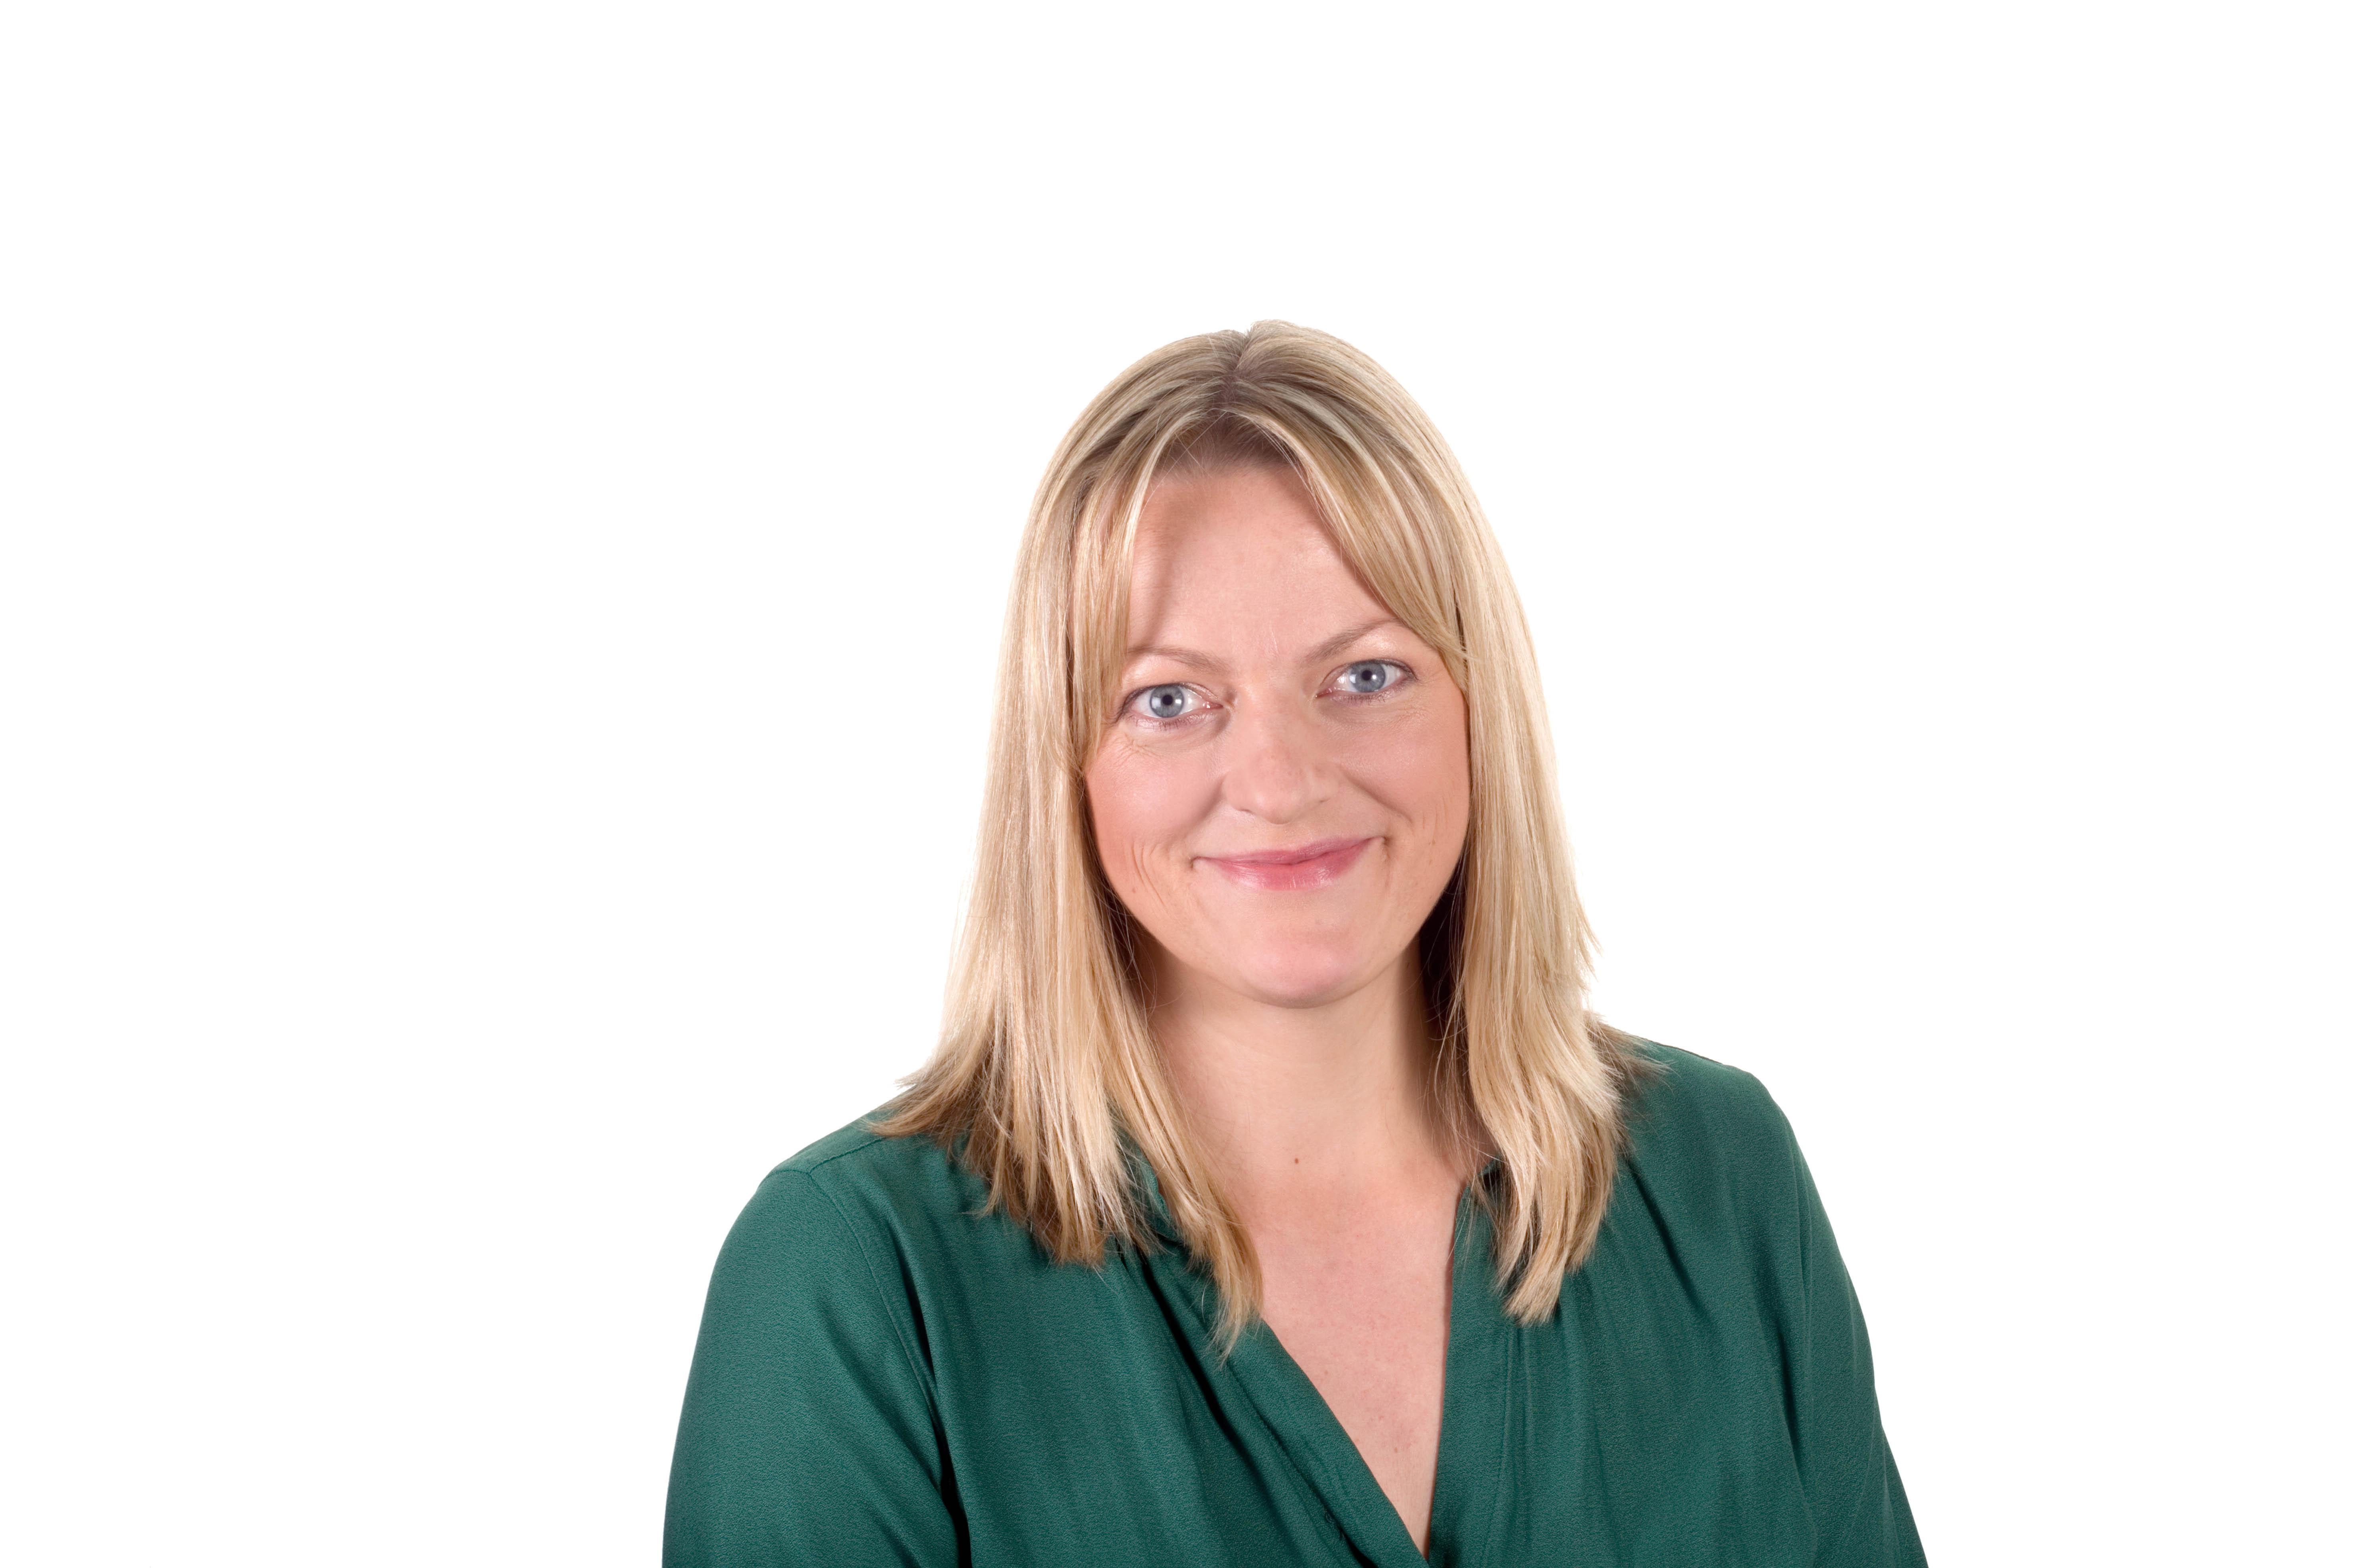 Amanda Green, ICS Business Partnership Manager